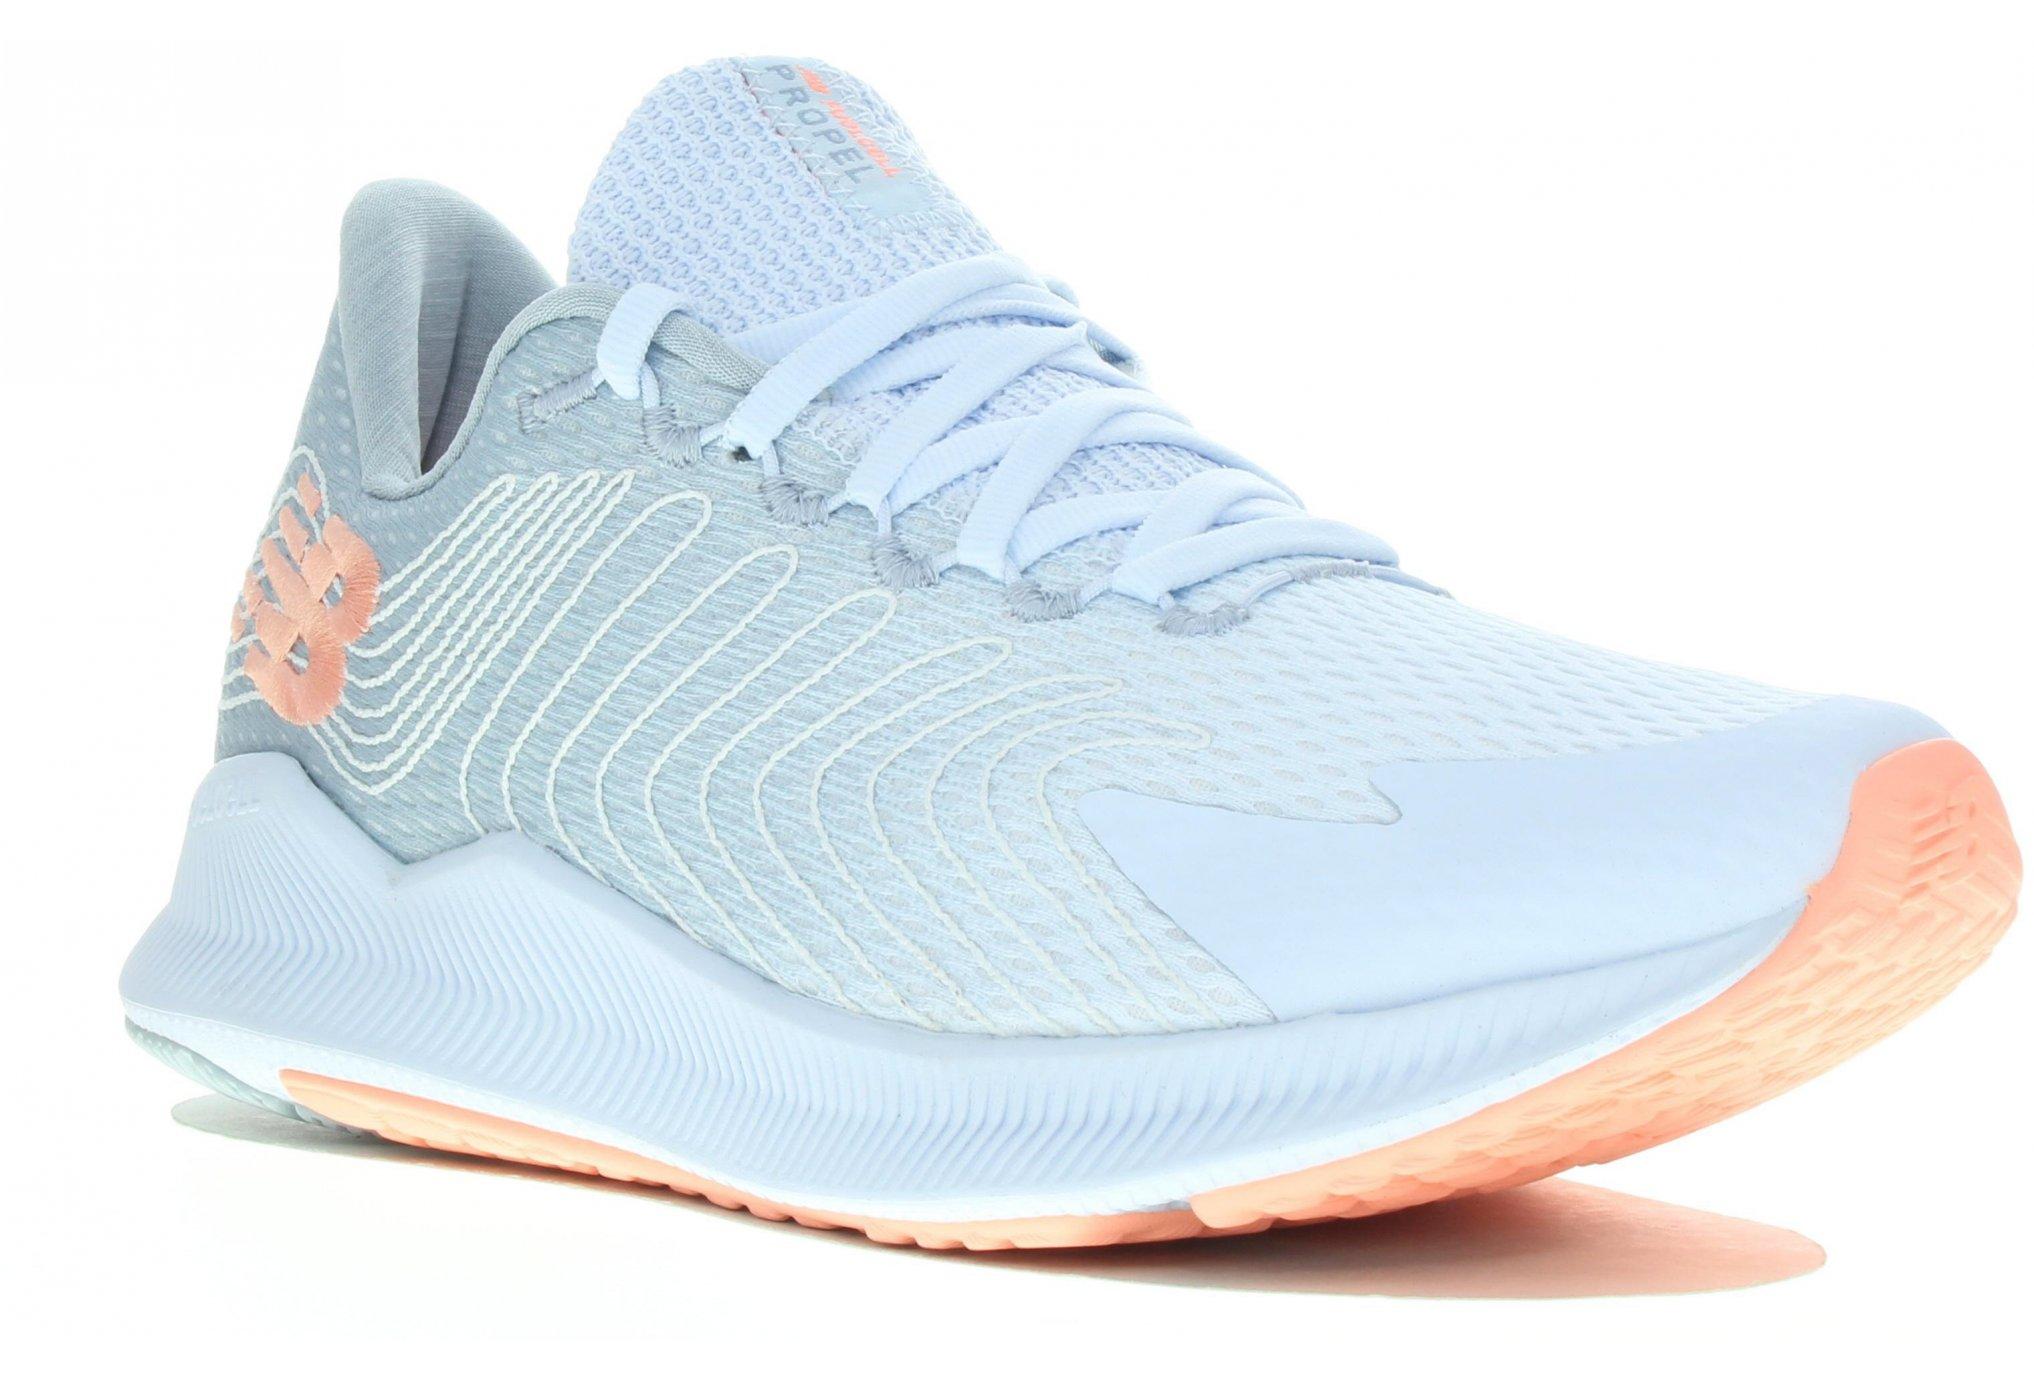 New Balance FuelCell Propel Chaussures running femme